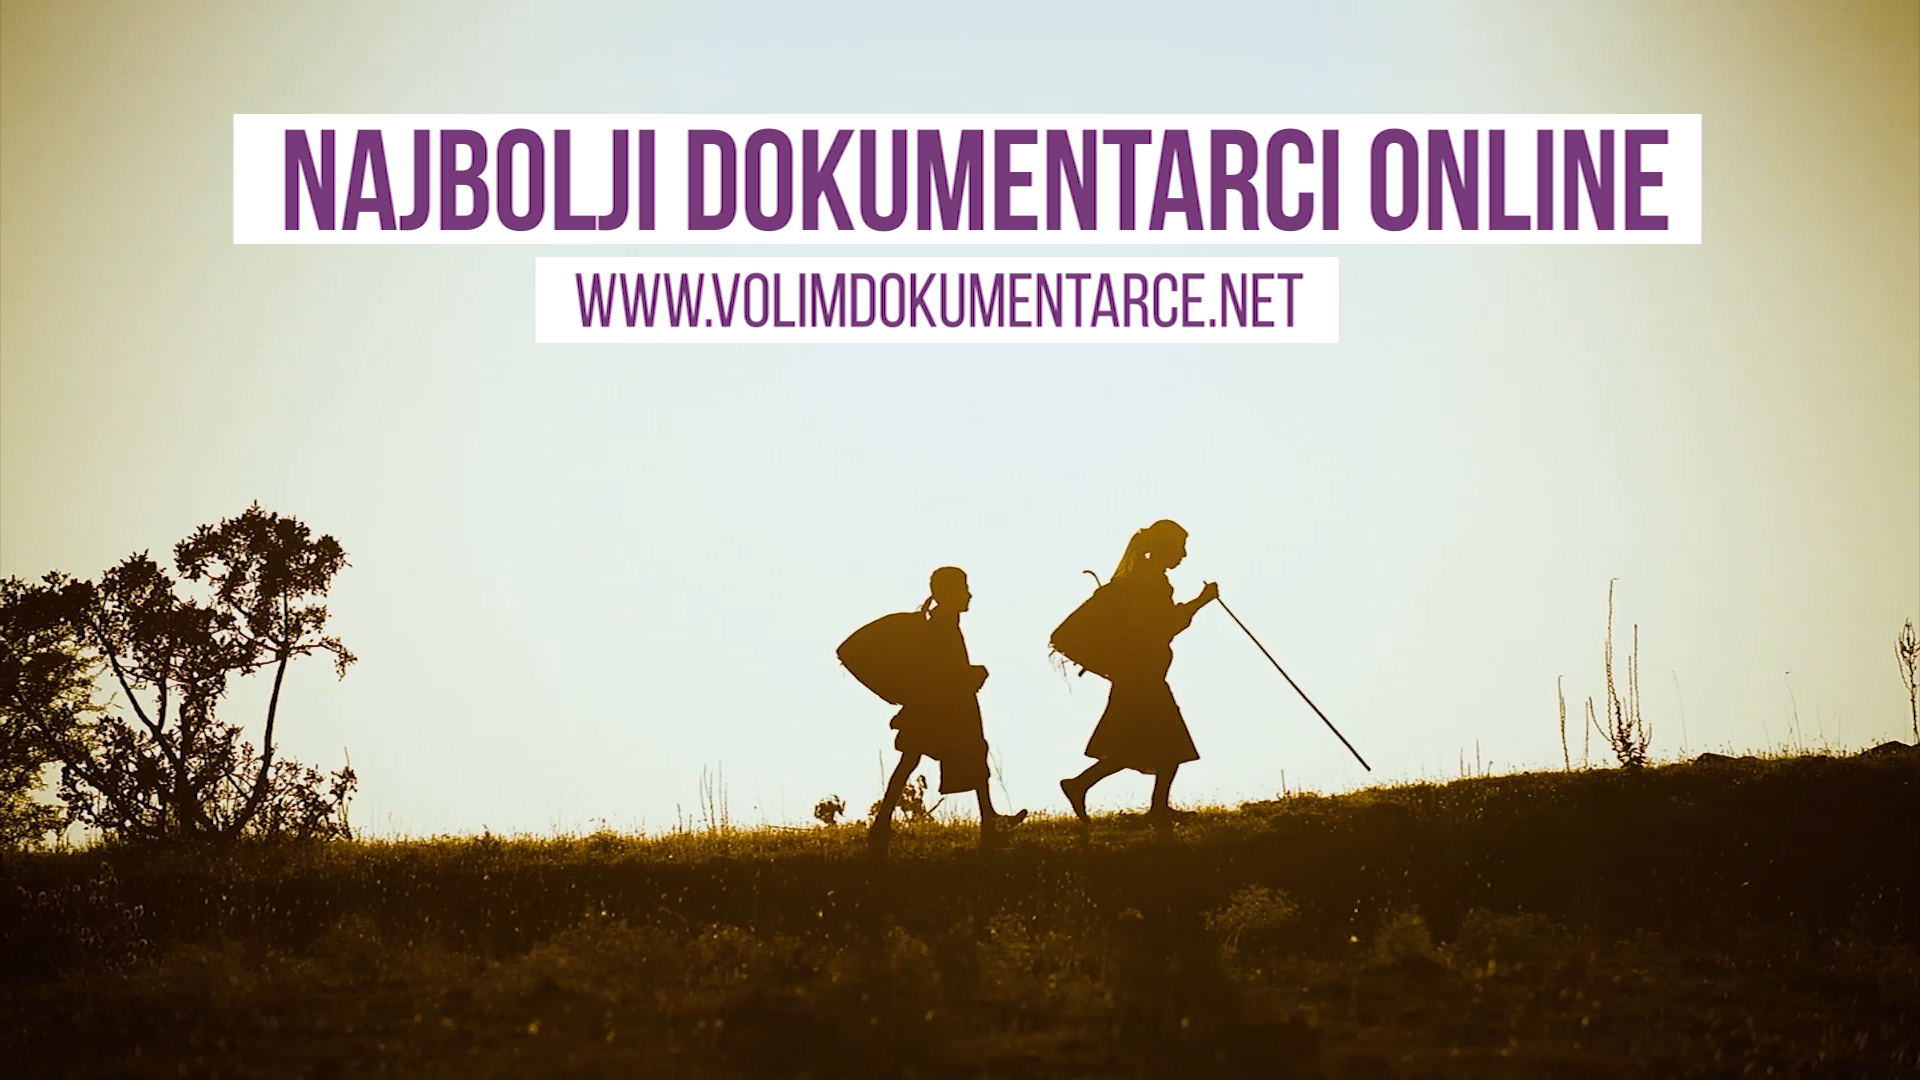 volimdokumentarce.net